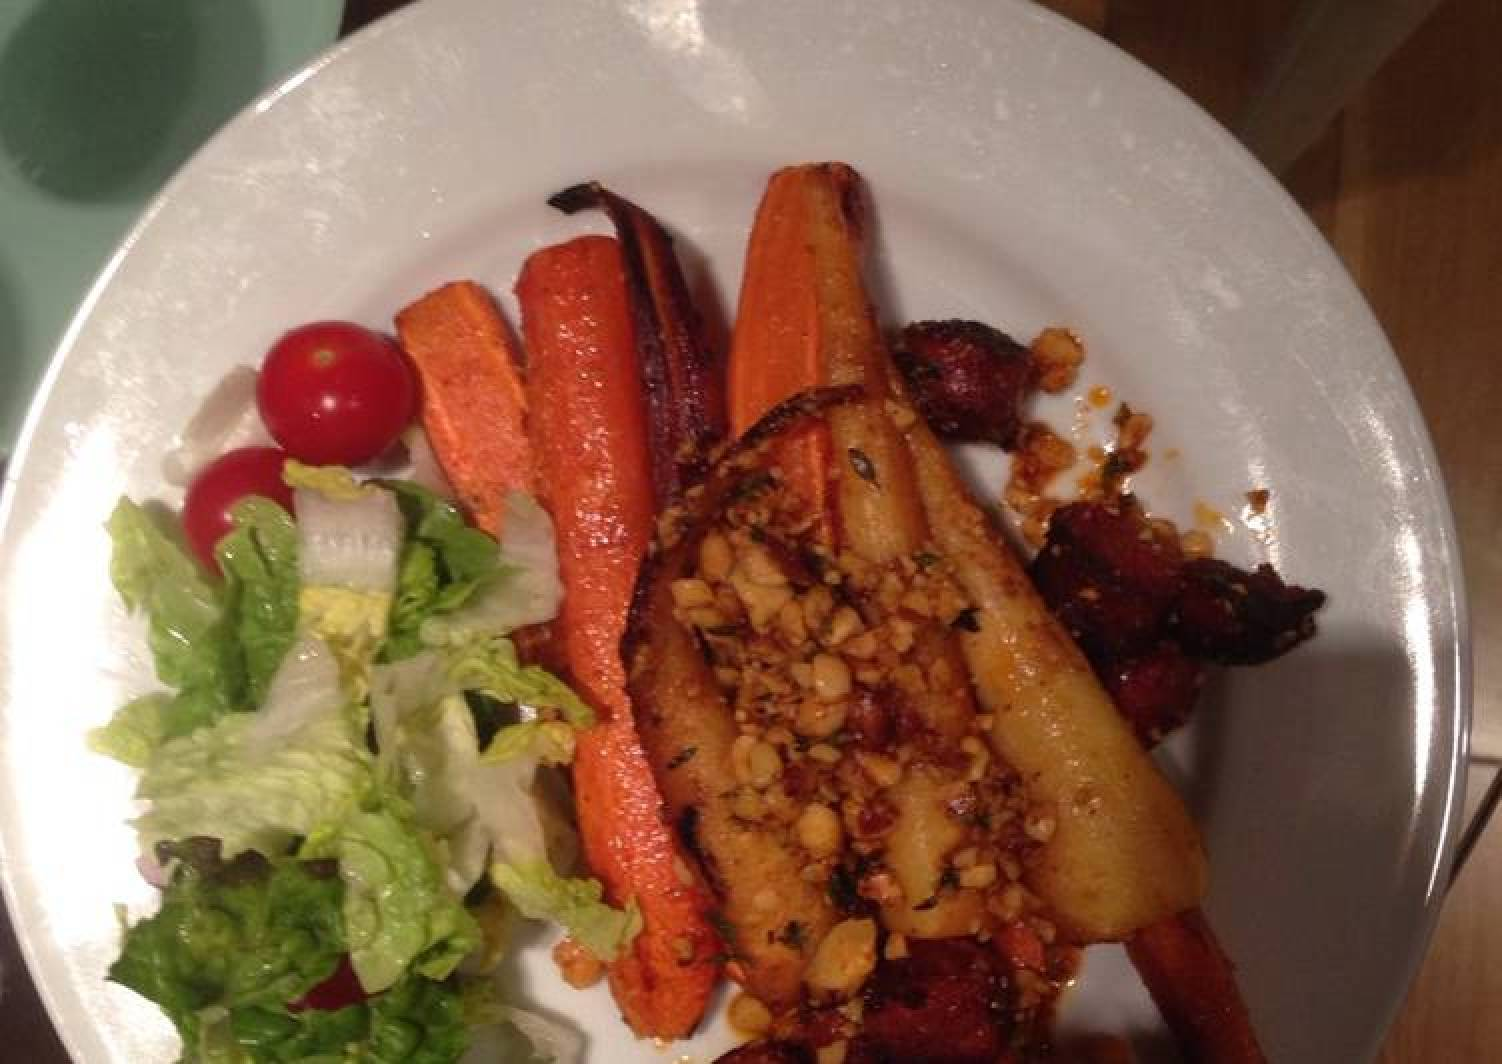 Roasted carrots, parsnips and chorizo